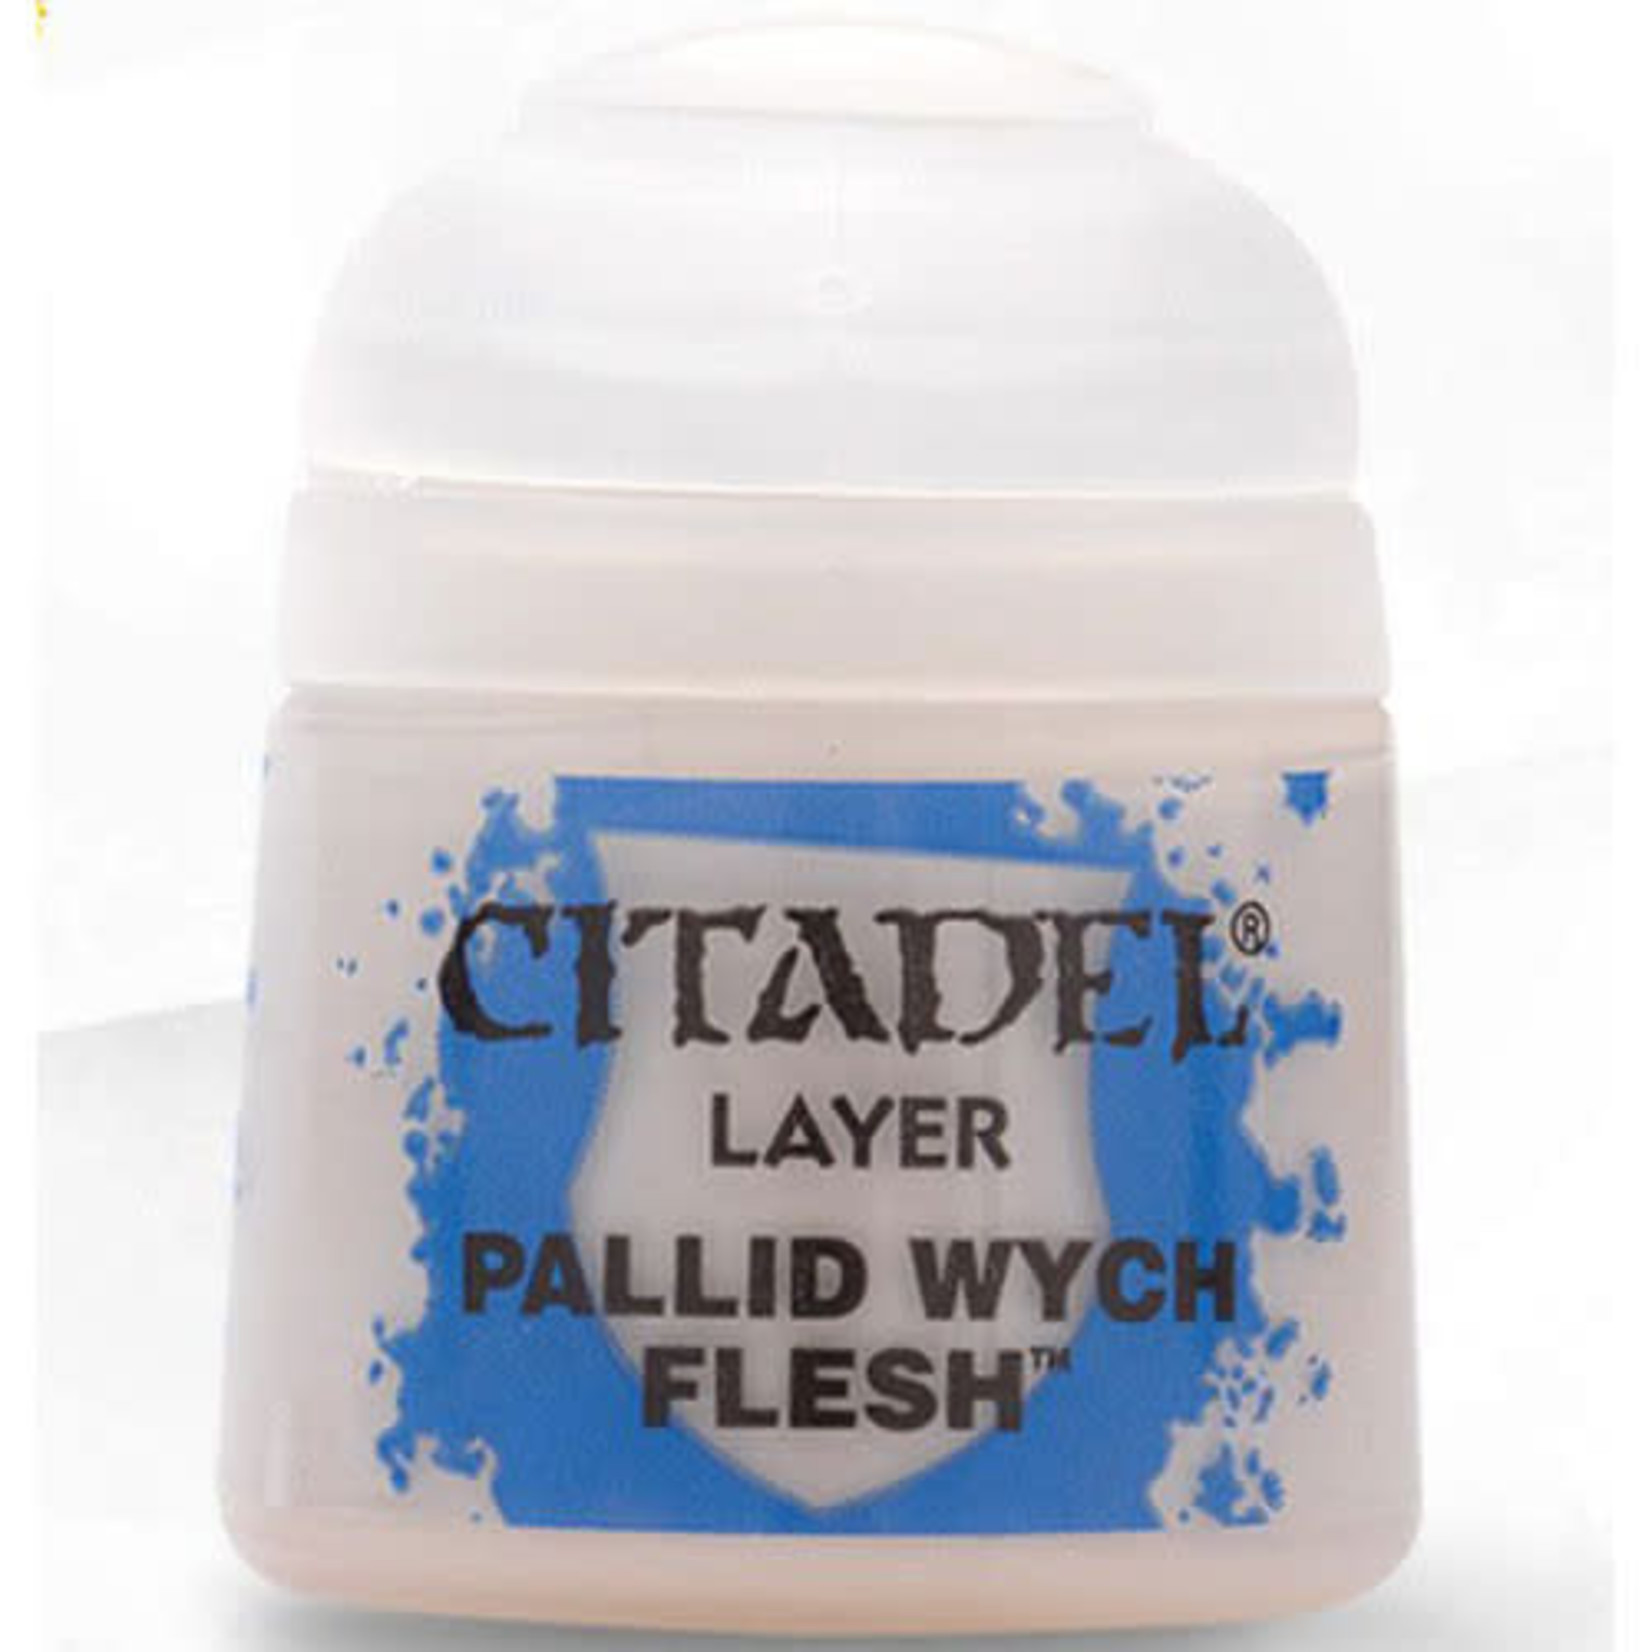 Citadel Citadel Paint - Layer: Pallid Wych Flesh